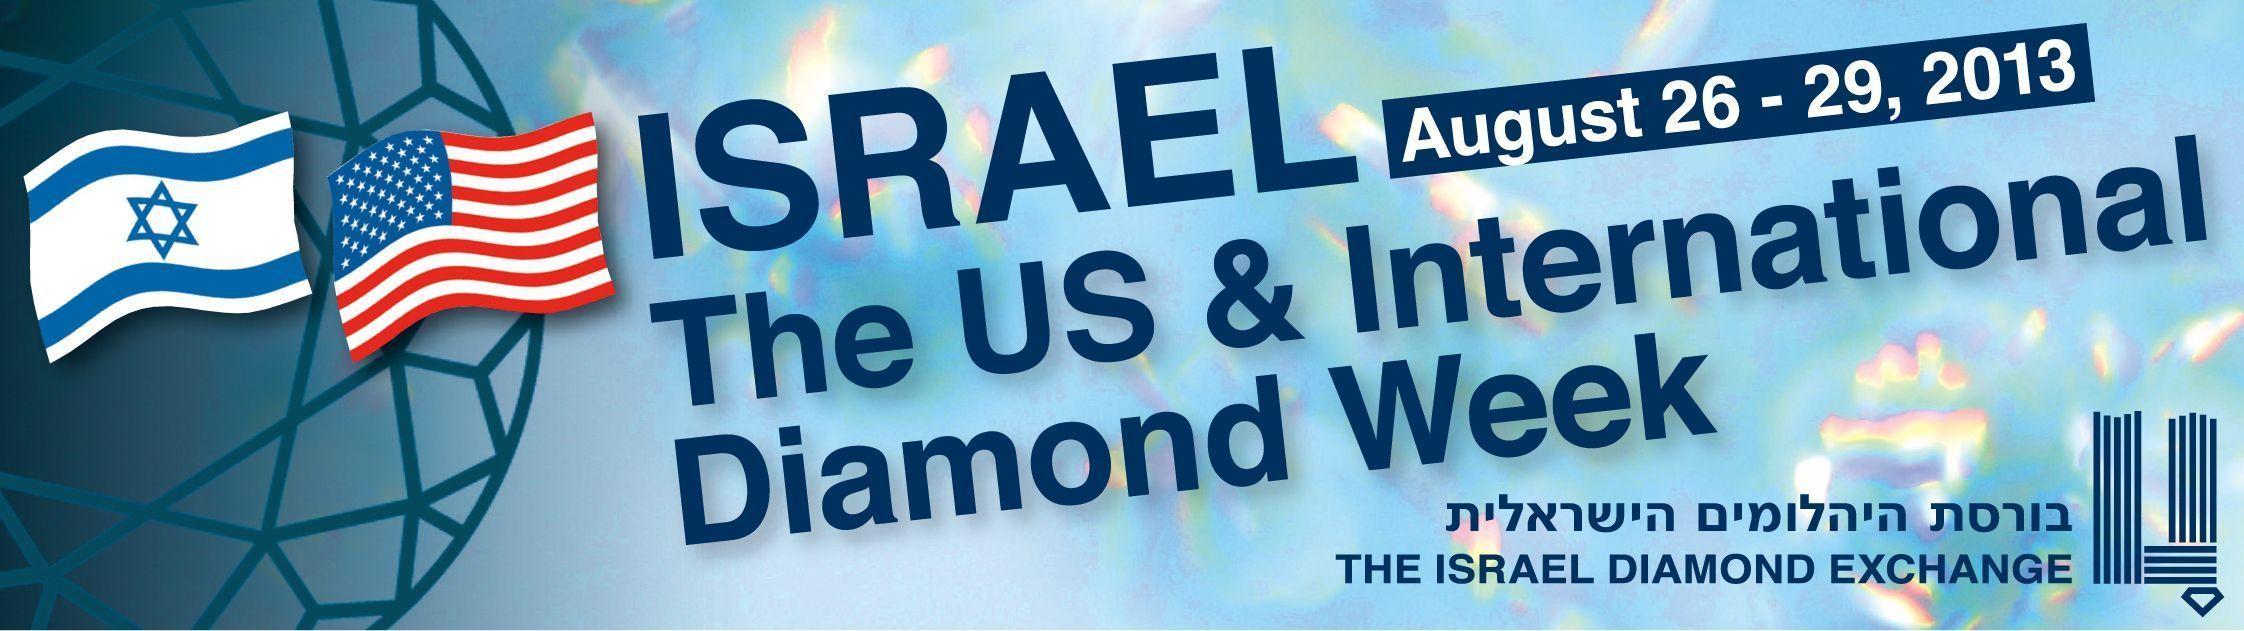 Israel's US & International Diamond Week Runs August 26-29